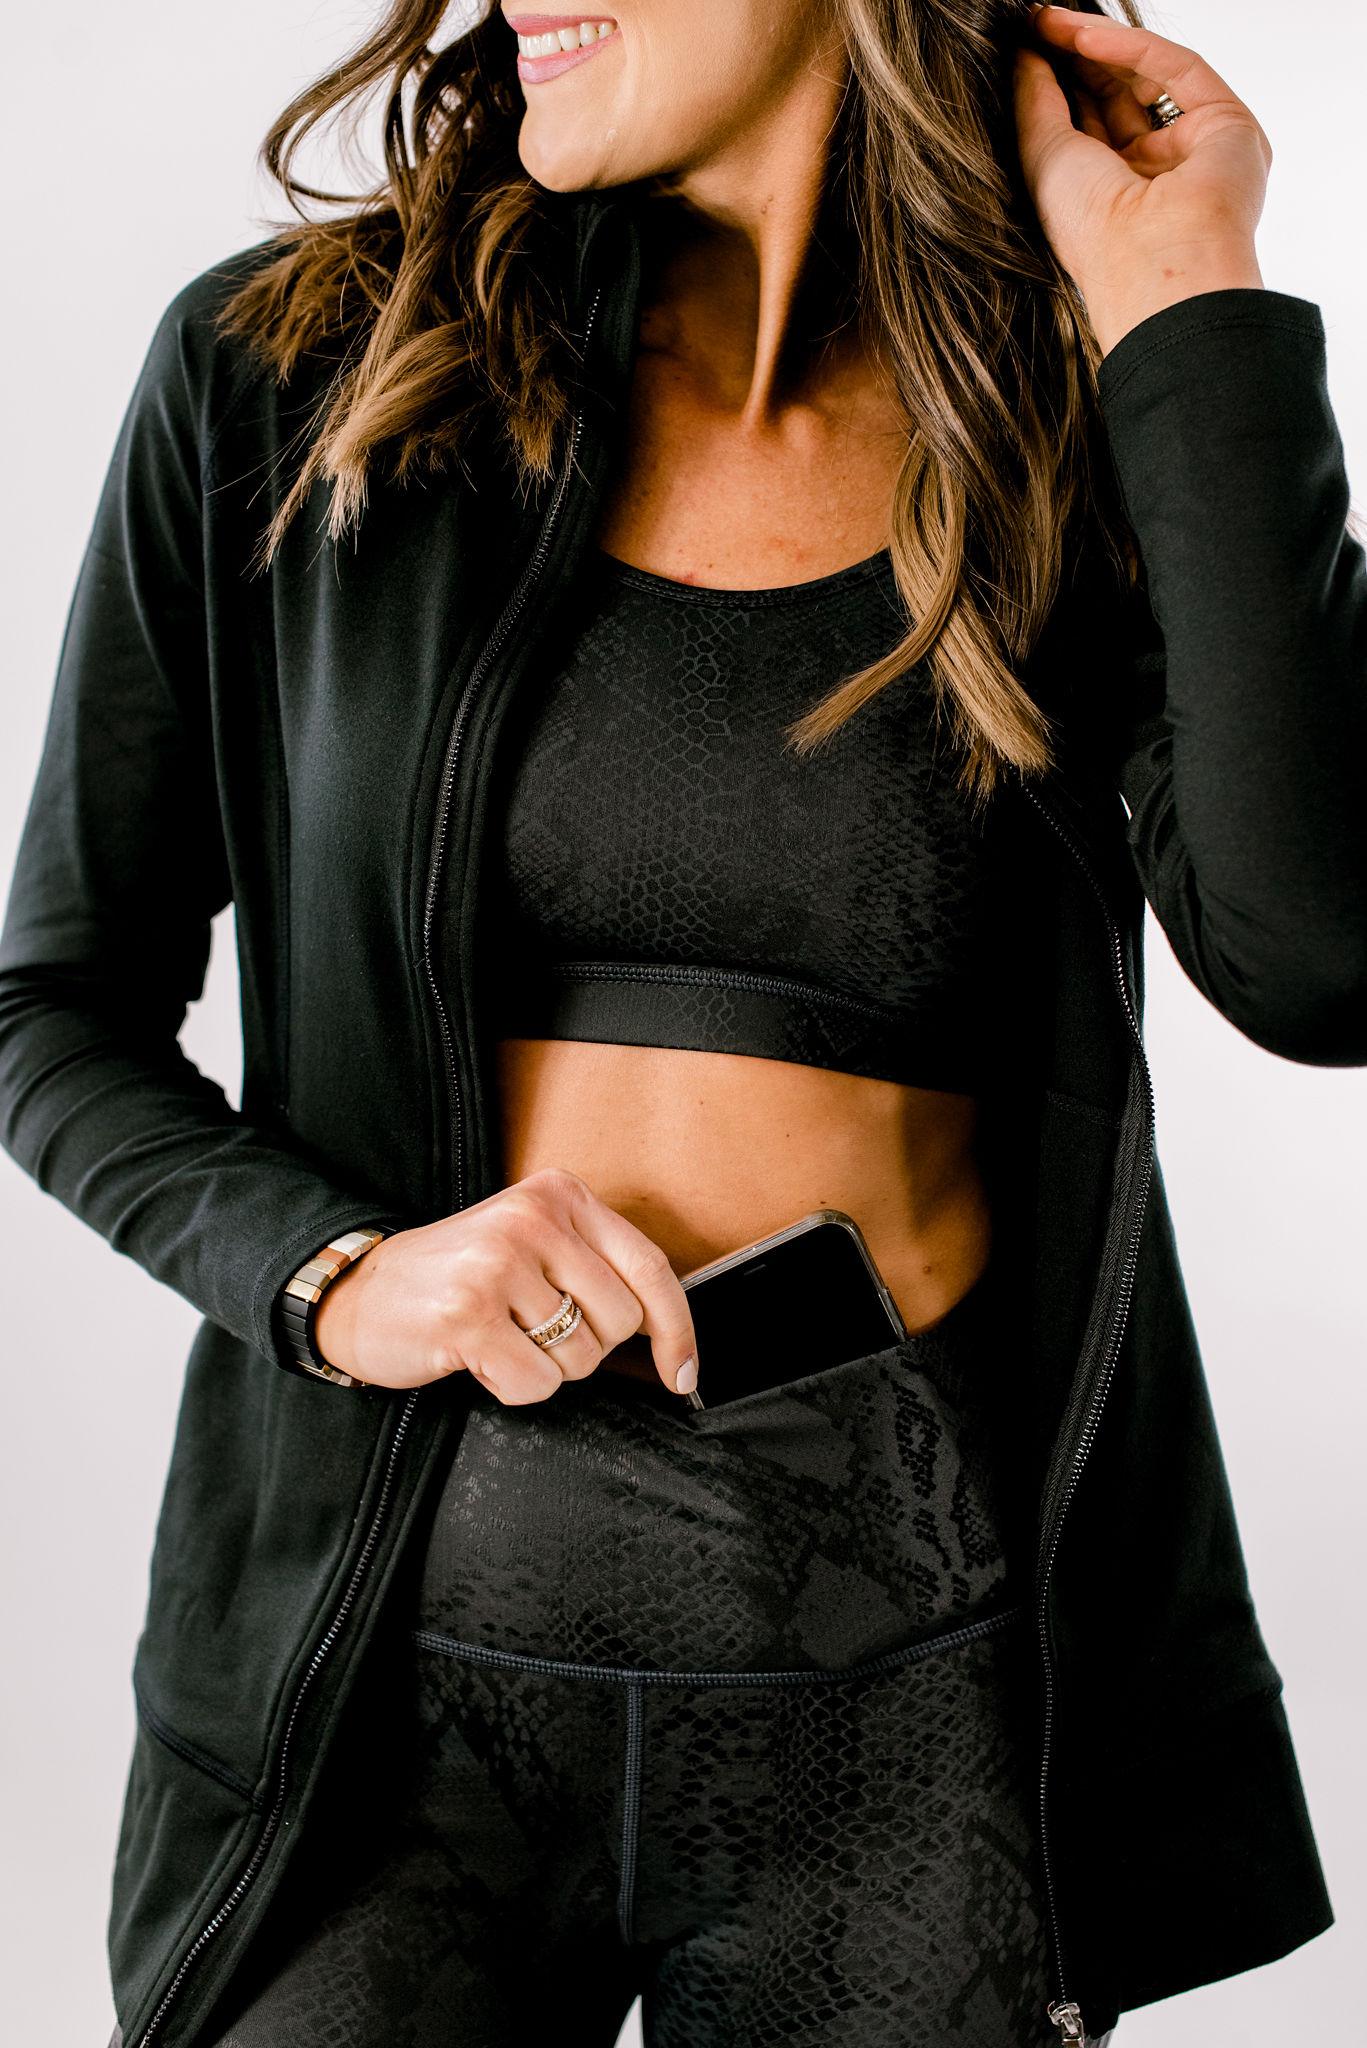 snakeskin leggings, cellphone pocket, shop style your senses, athleisure wear for women, activewear for women